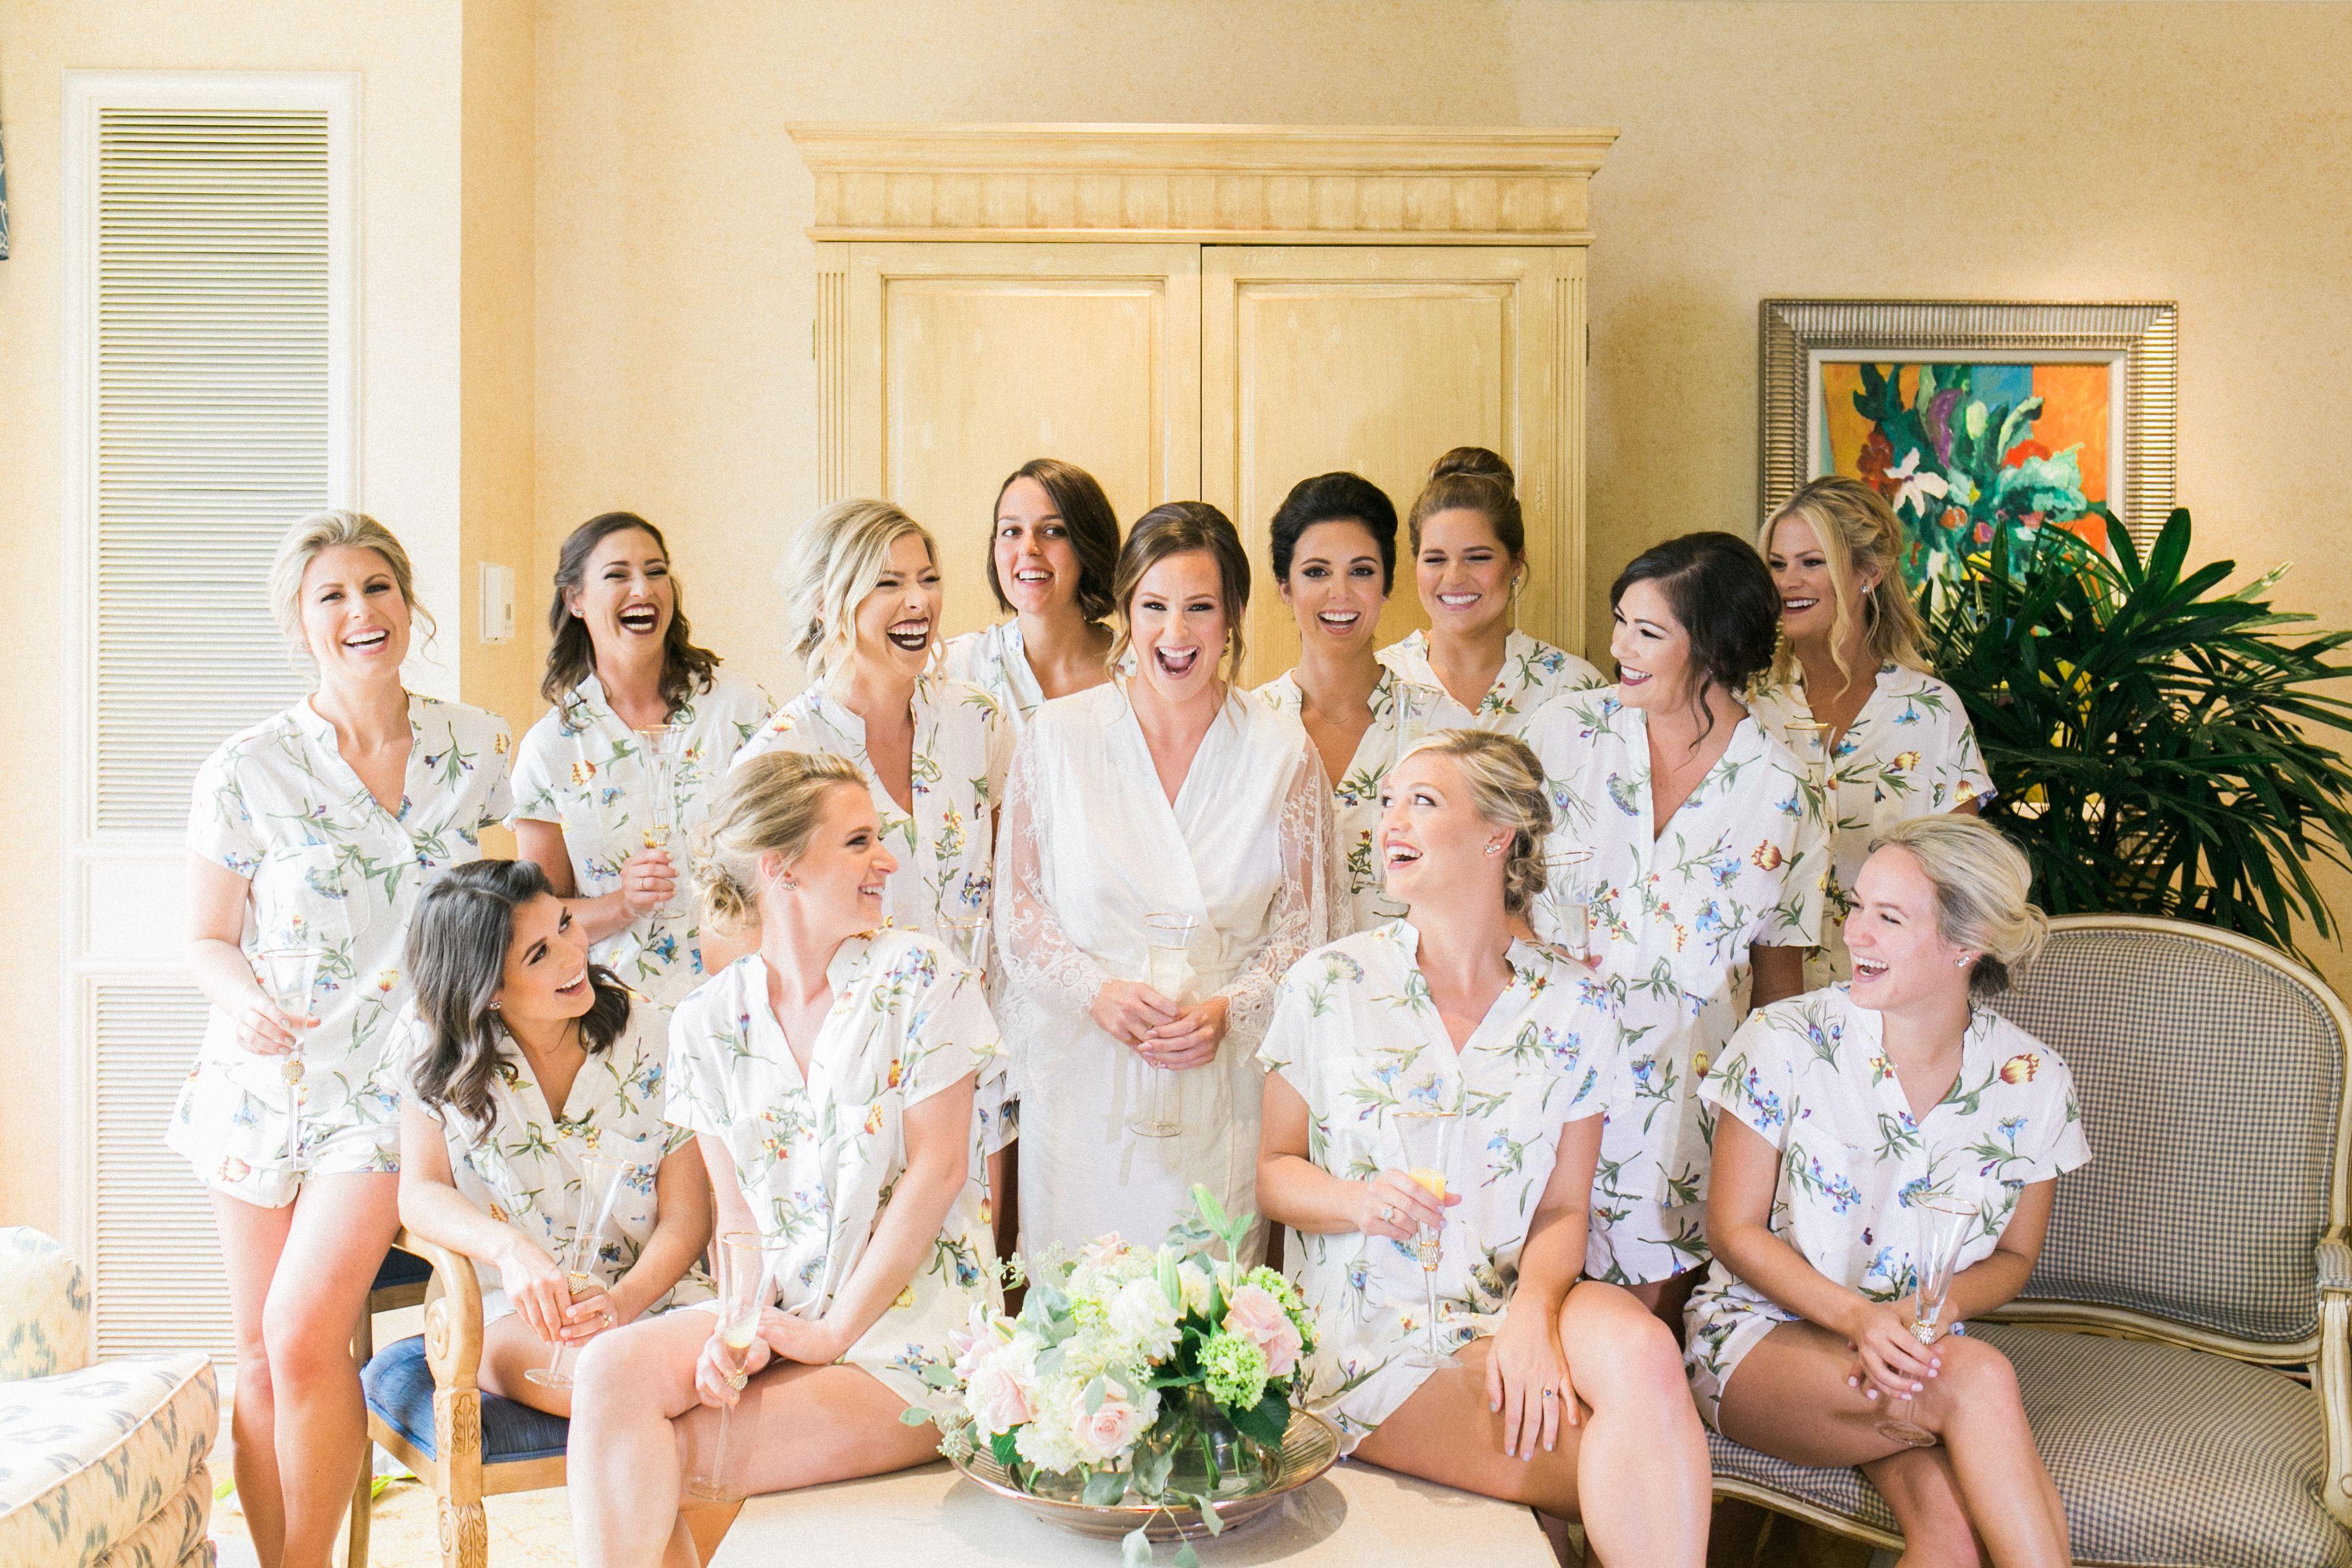 Bridesmaid Pajama Set Wedding Party Ideas Wedding Gifts Bridal